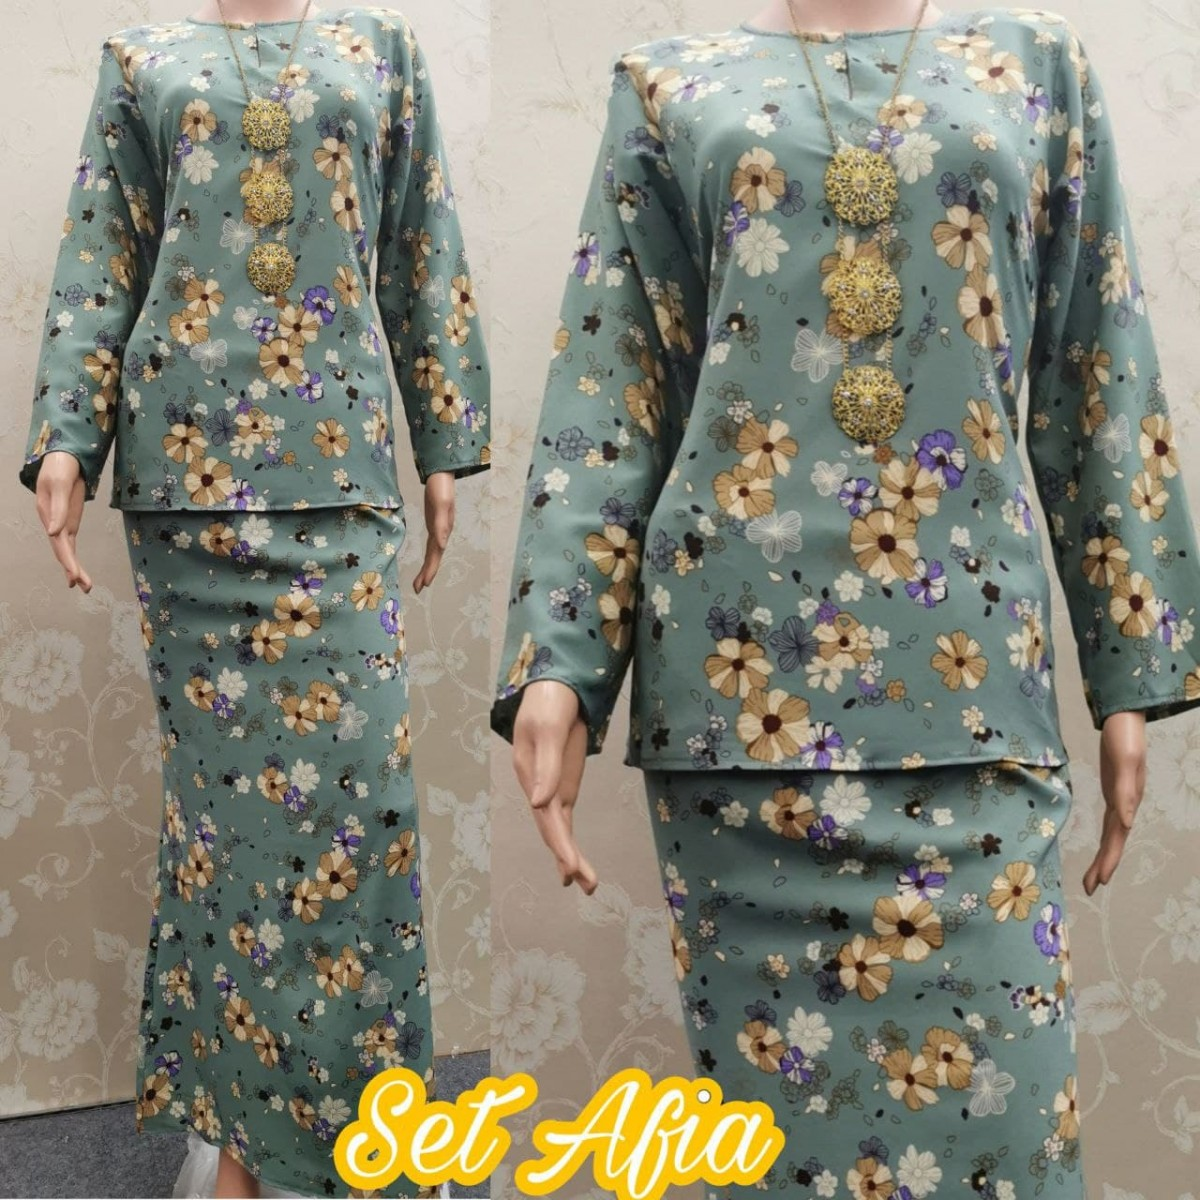 SET AFIA - F5 - Aiman Collection